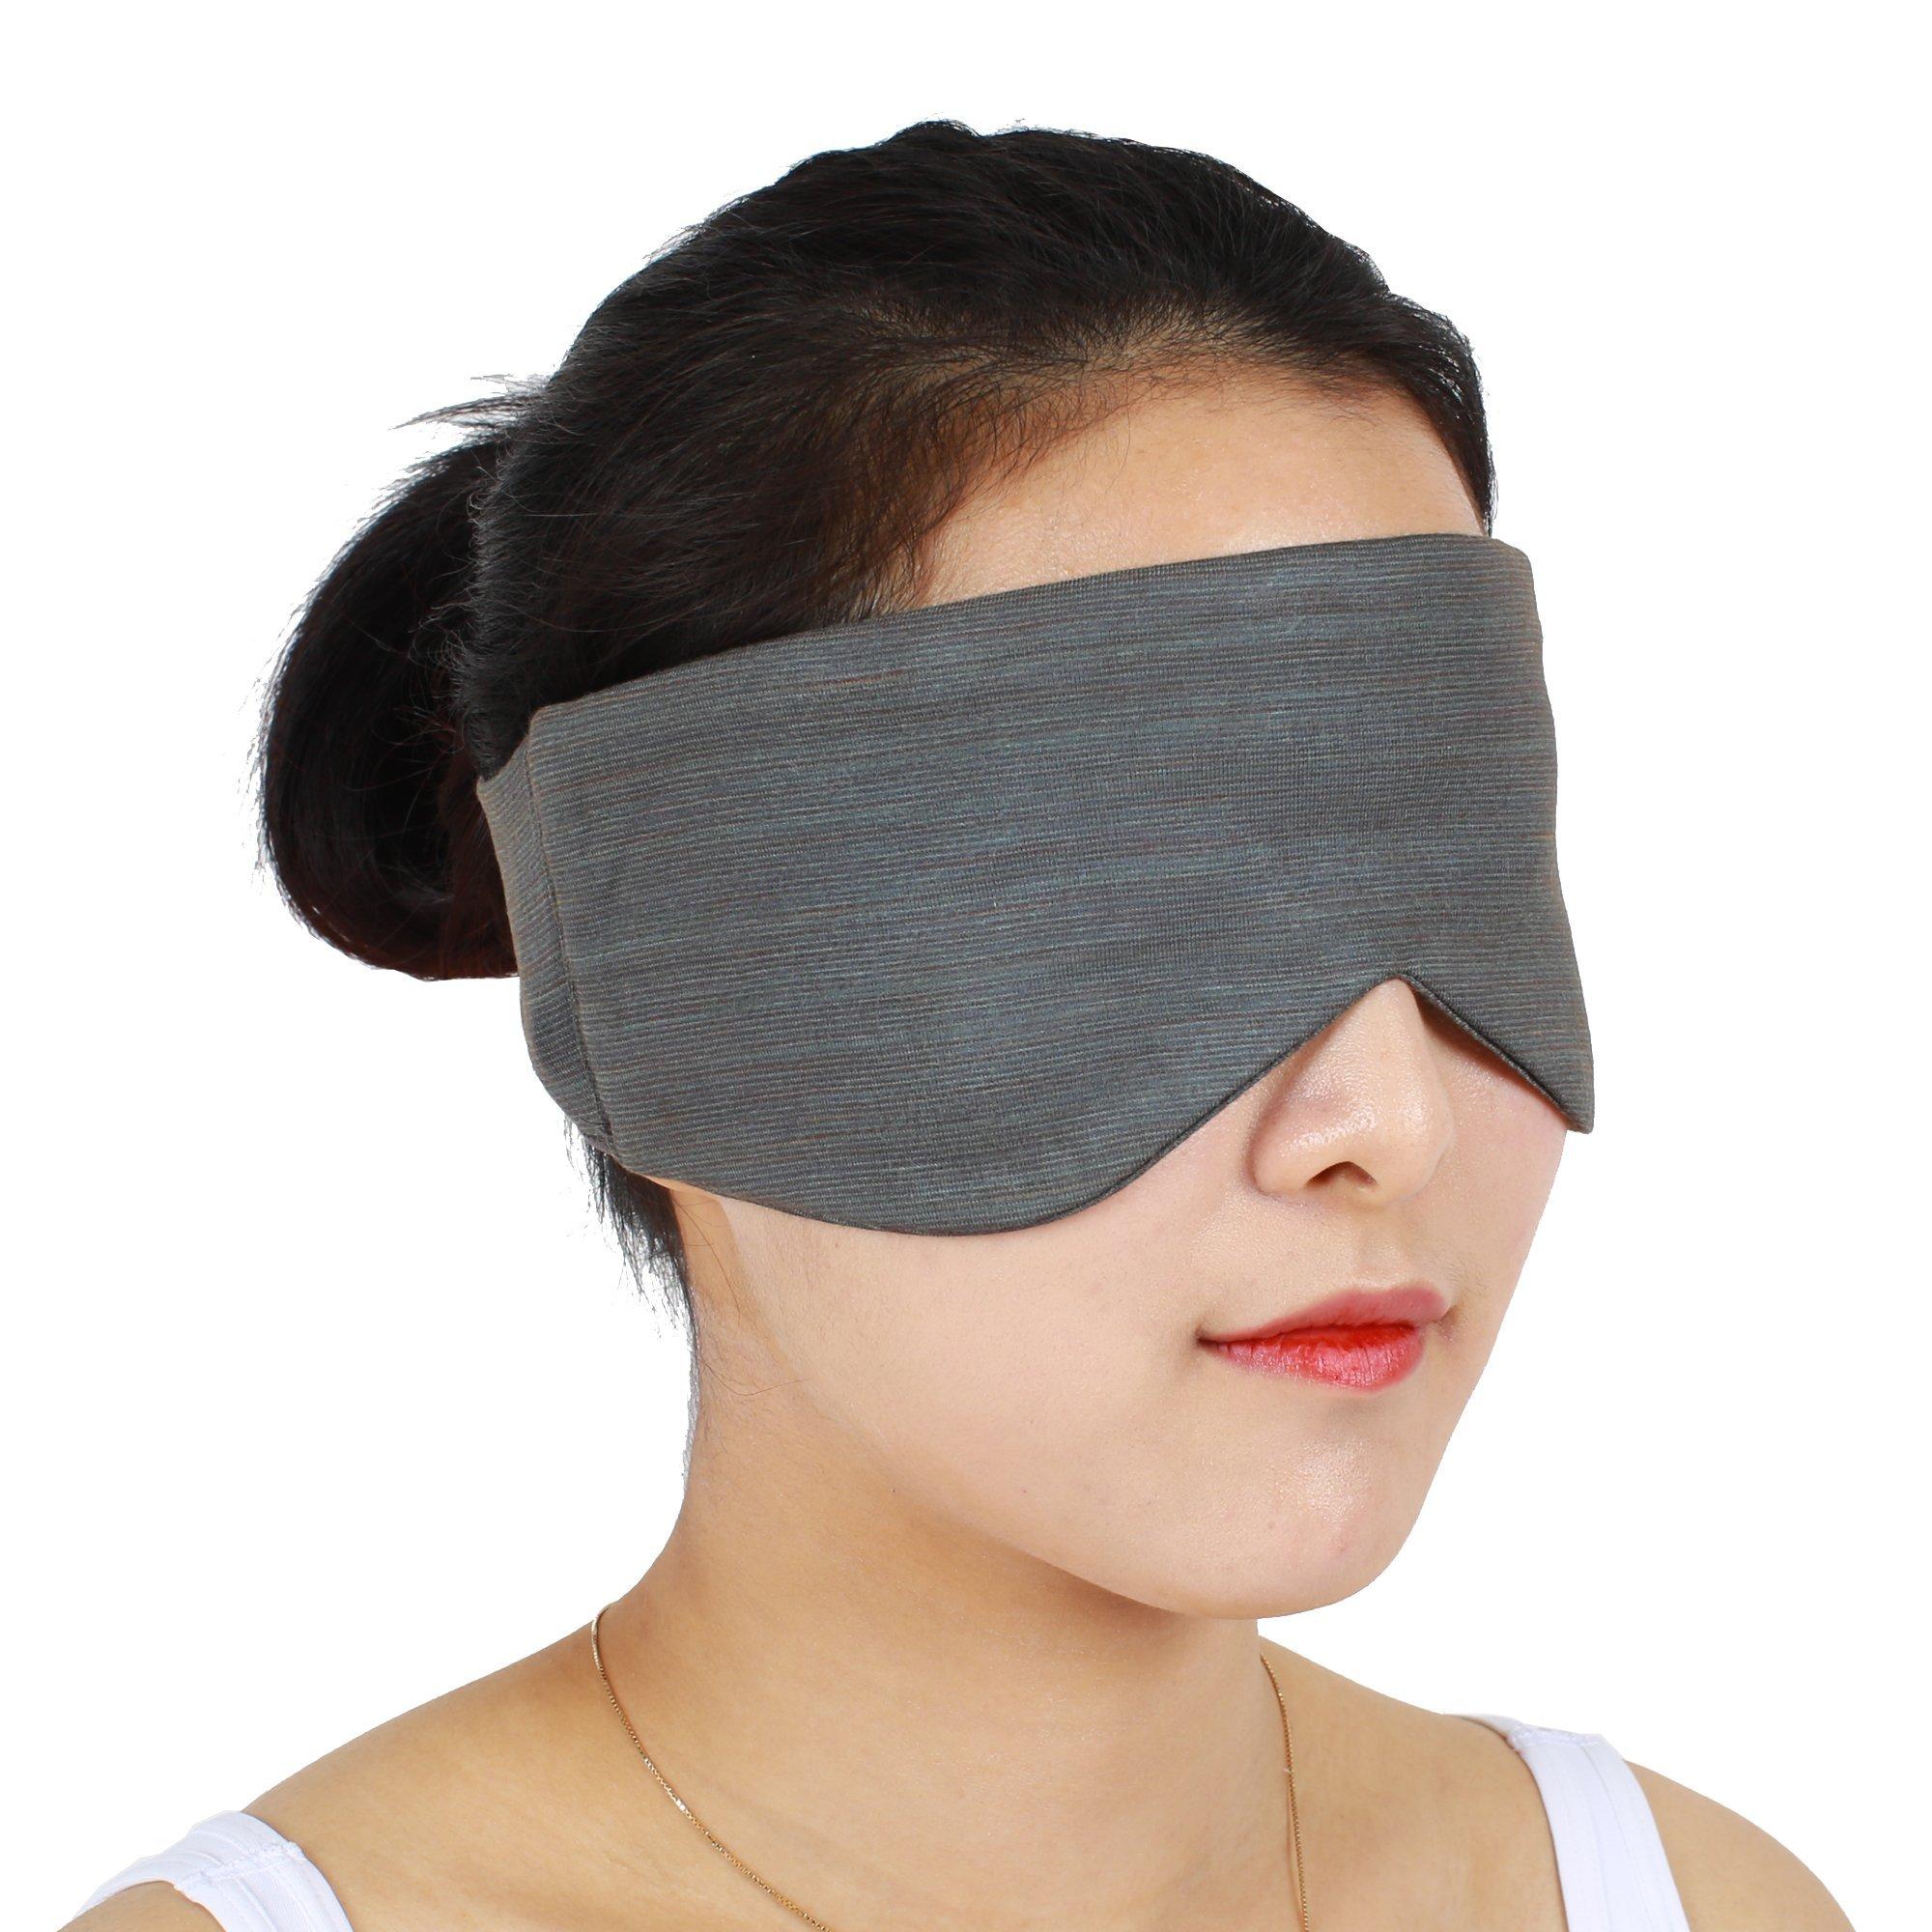 TEMPUP Eye Band Sleep Mask, Self Recovery Wear, Headache Helper, Helps Full Night's Sleep - for Unisex Medium 1P